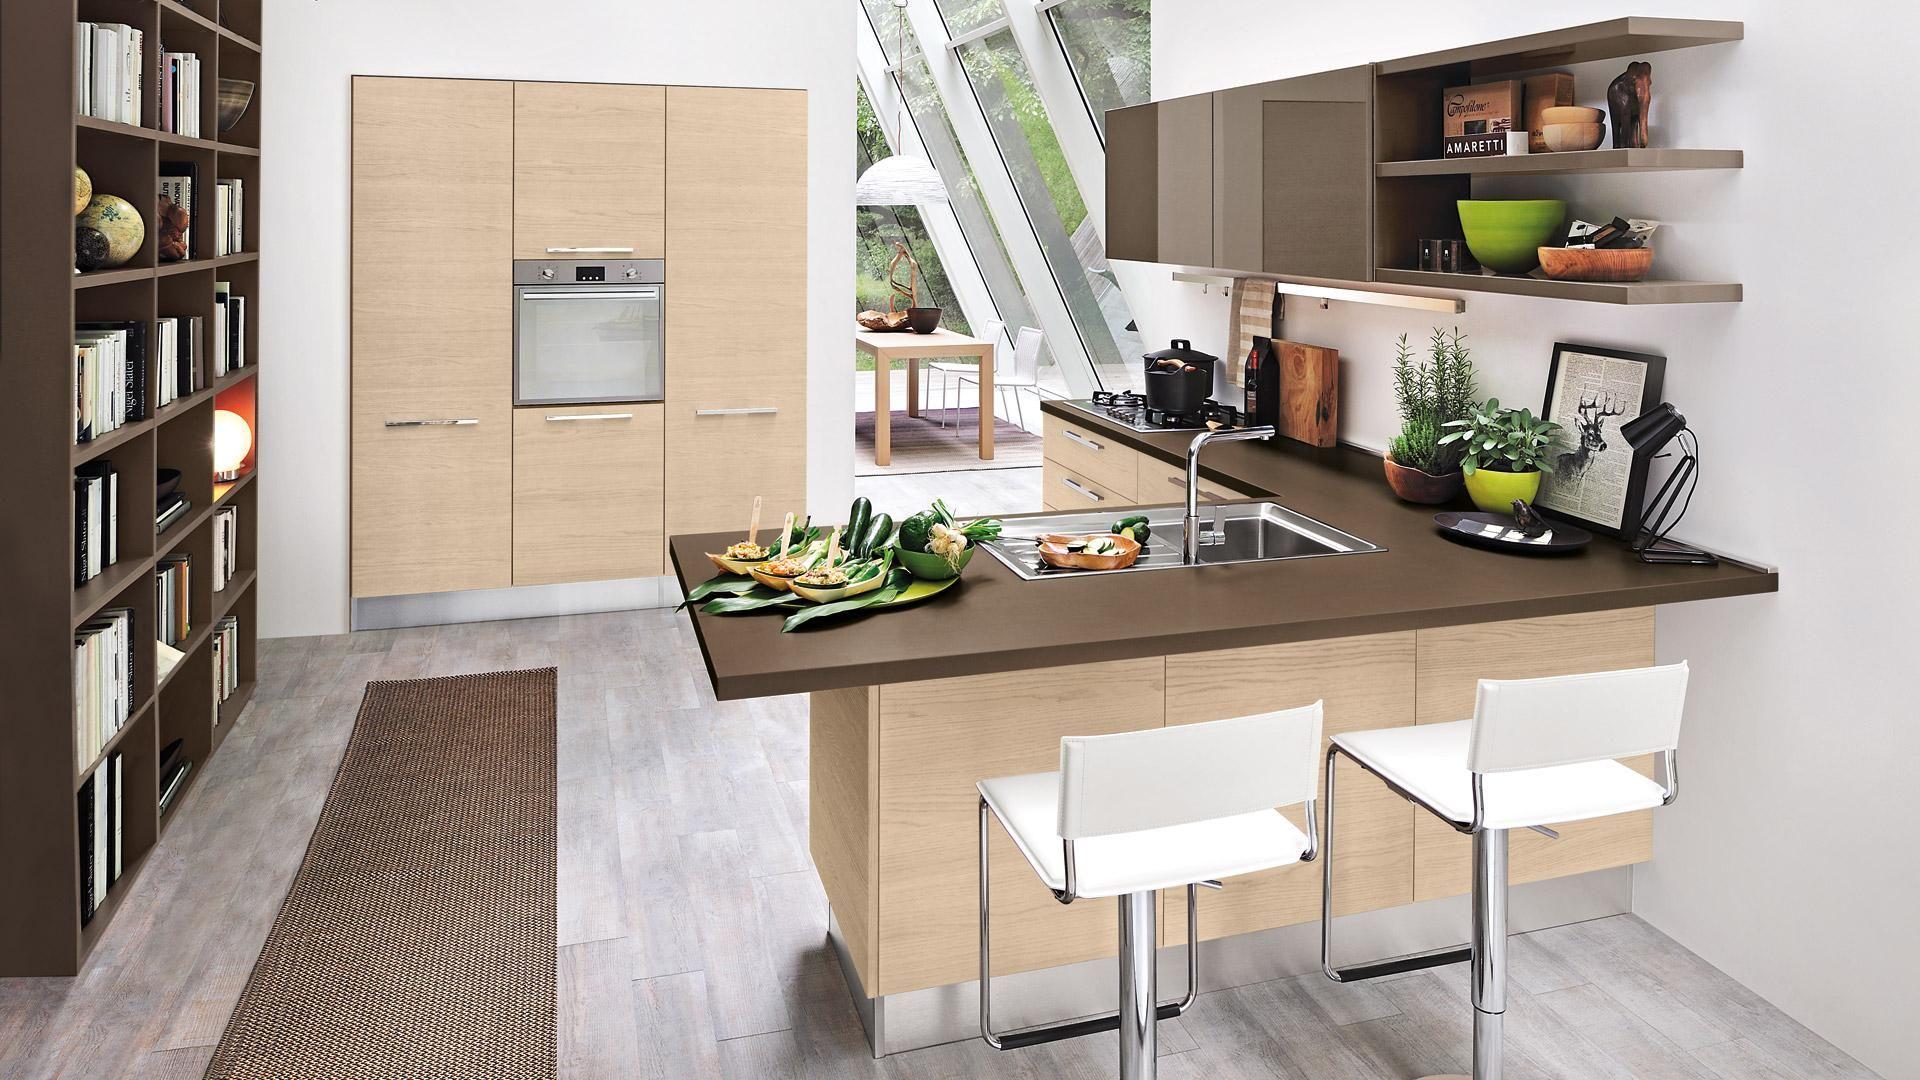 Pamela - Cucine Moderne - Cucine Lube | Cucina | Pinterest | Cucina